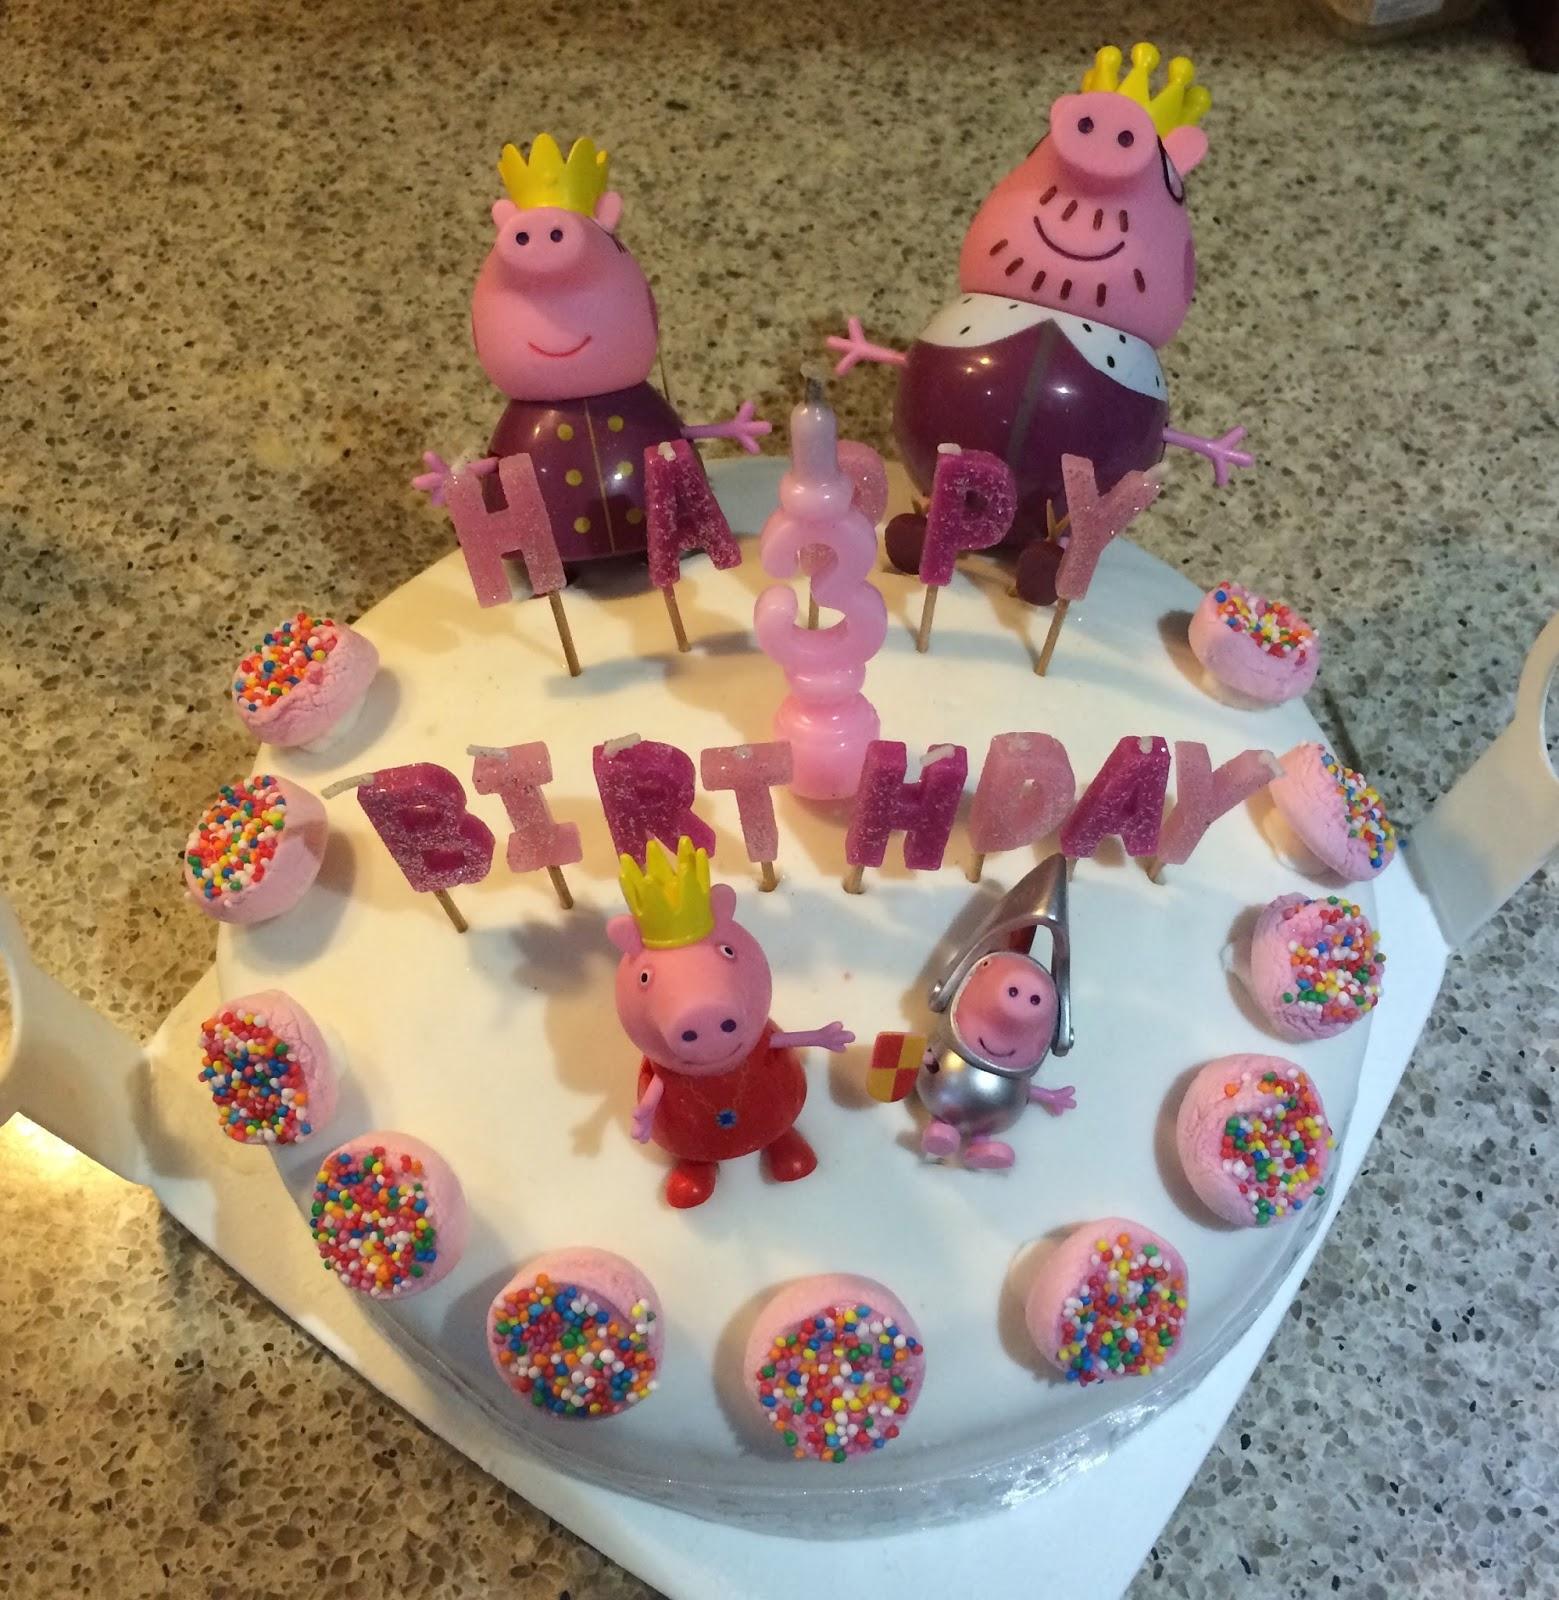 Mr Gift Peppa Pig Birthday Cake